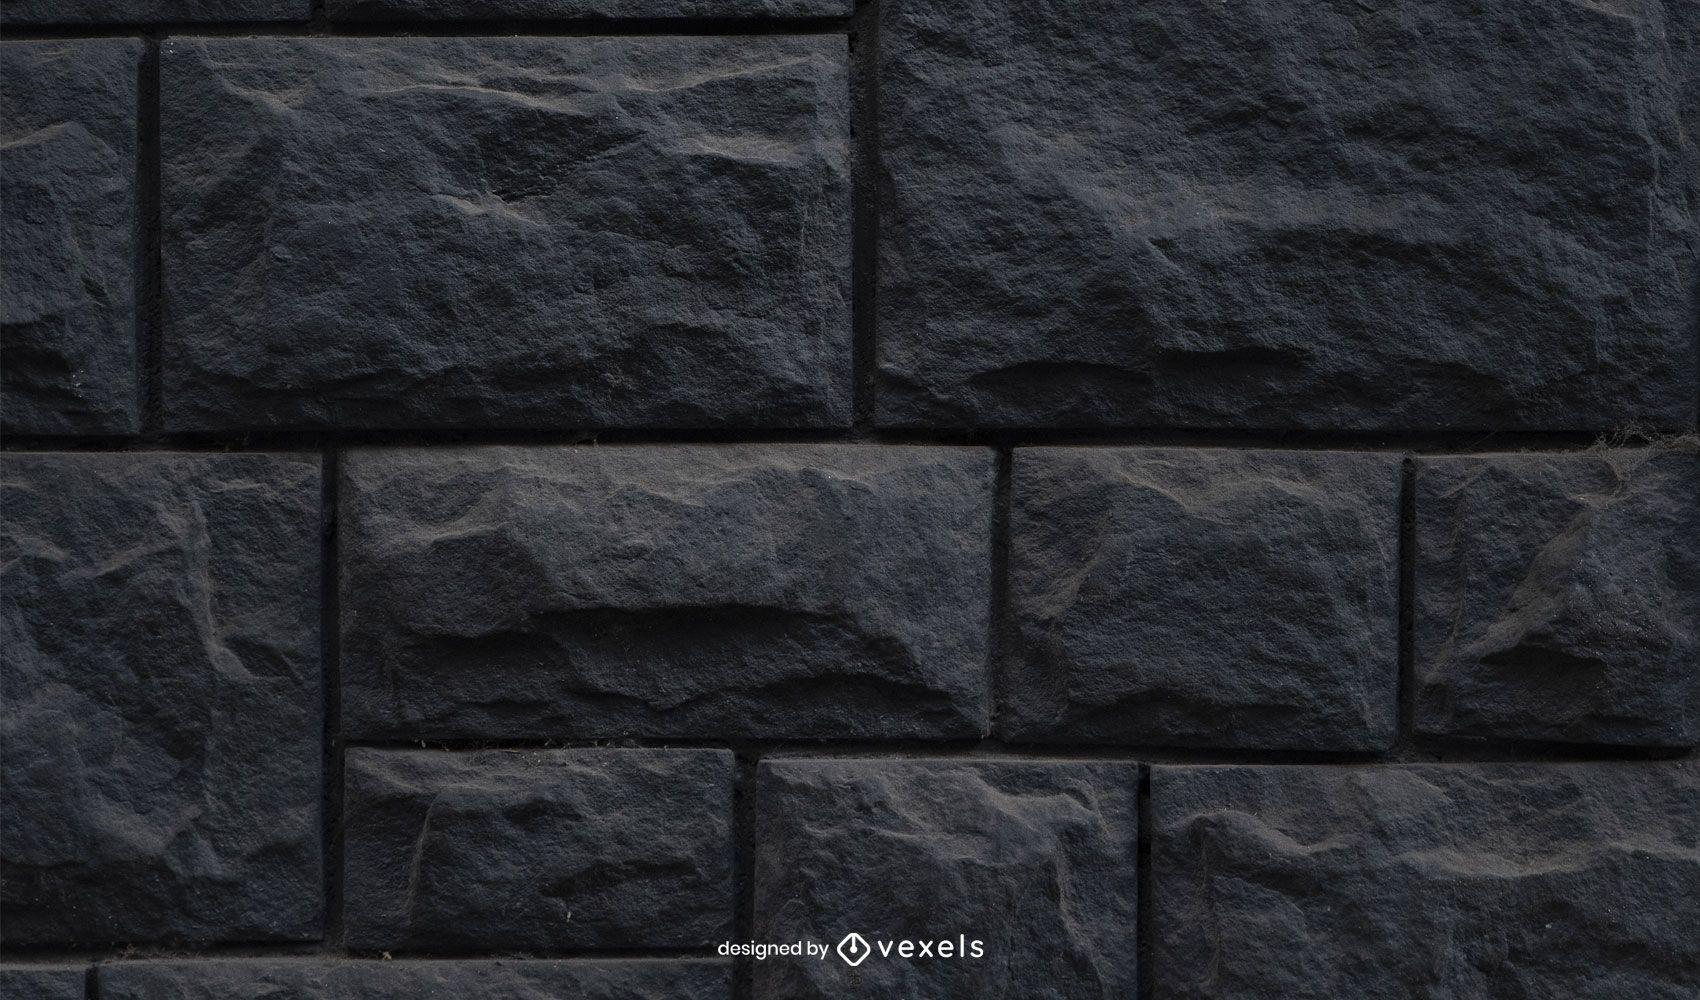 Black Stone Wall Texture